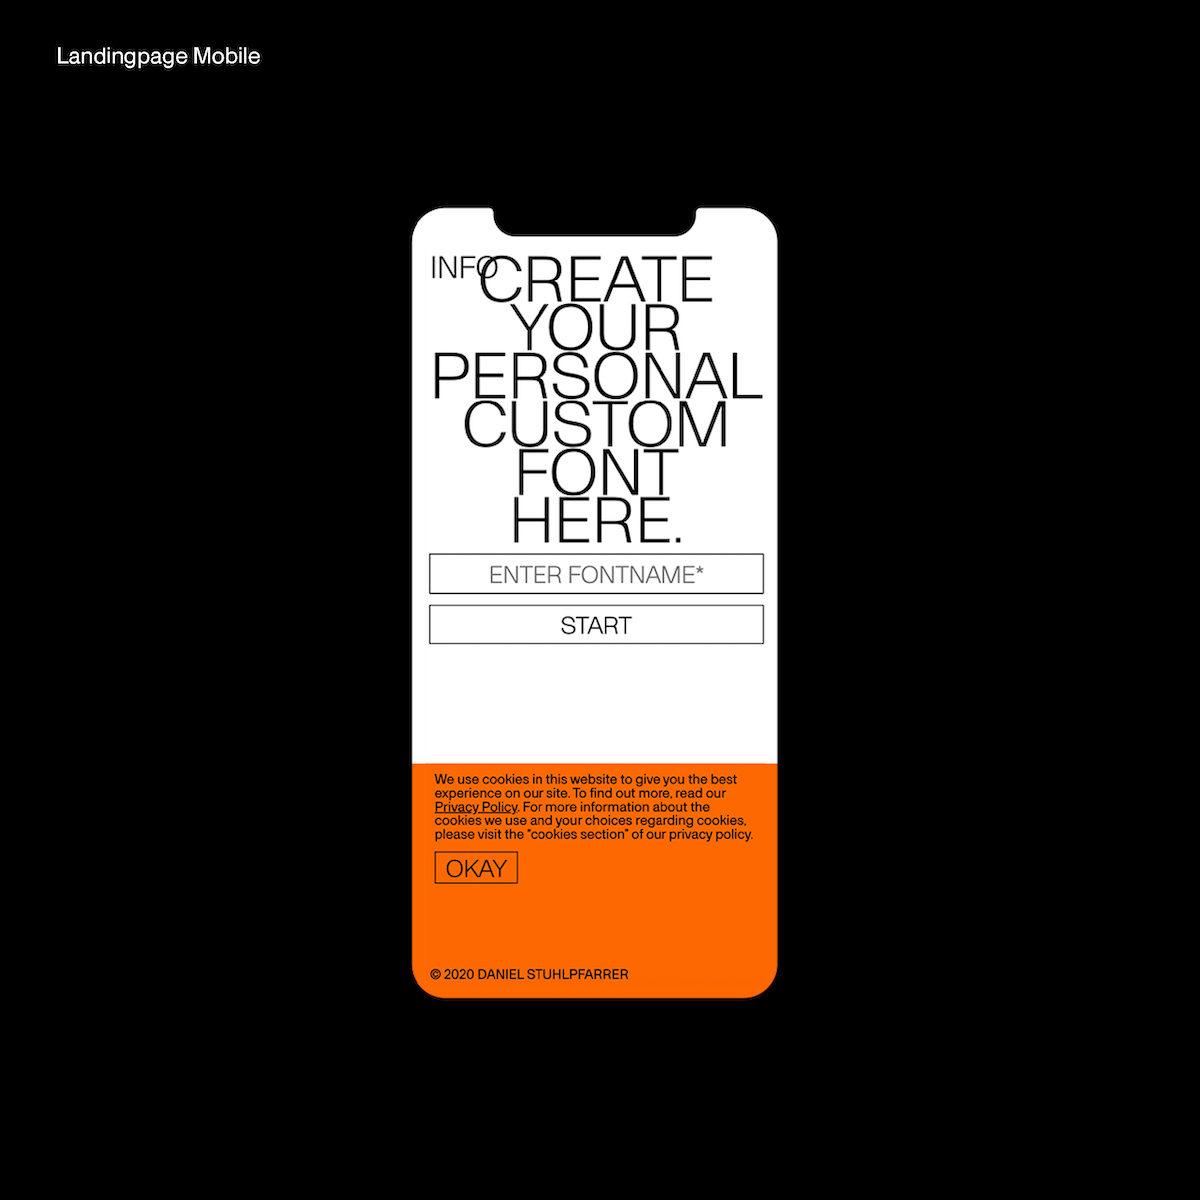 Custom Font Generator Mobile Landingpage